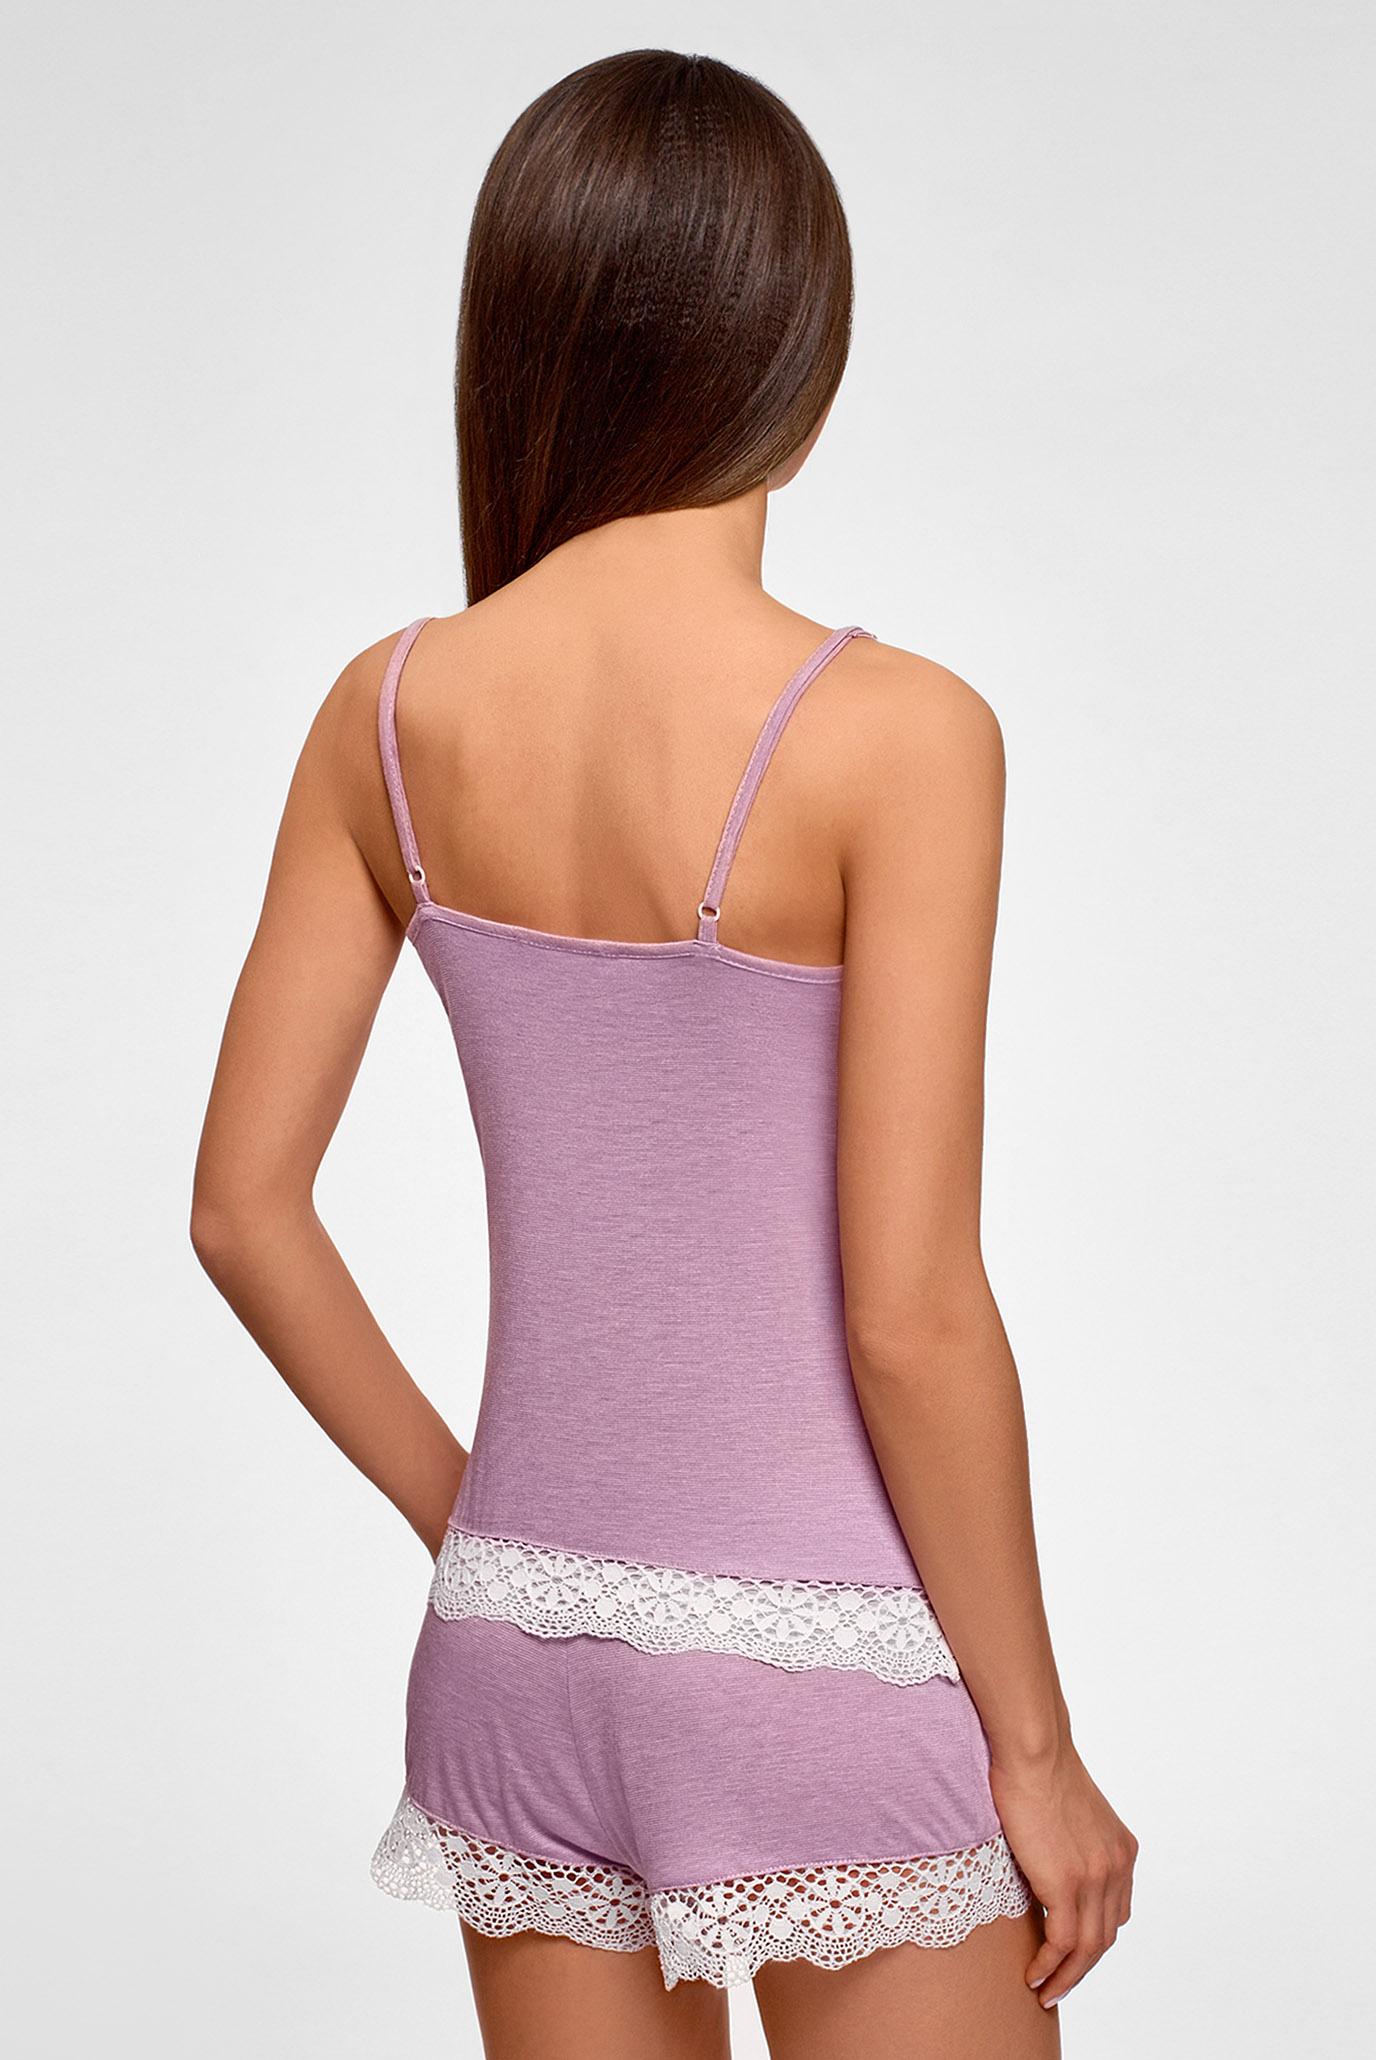 Женская сиреневая пижама (майка, шорты) Oodji